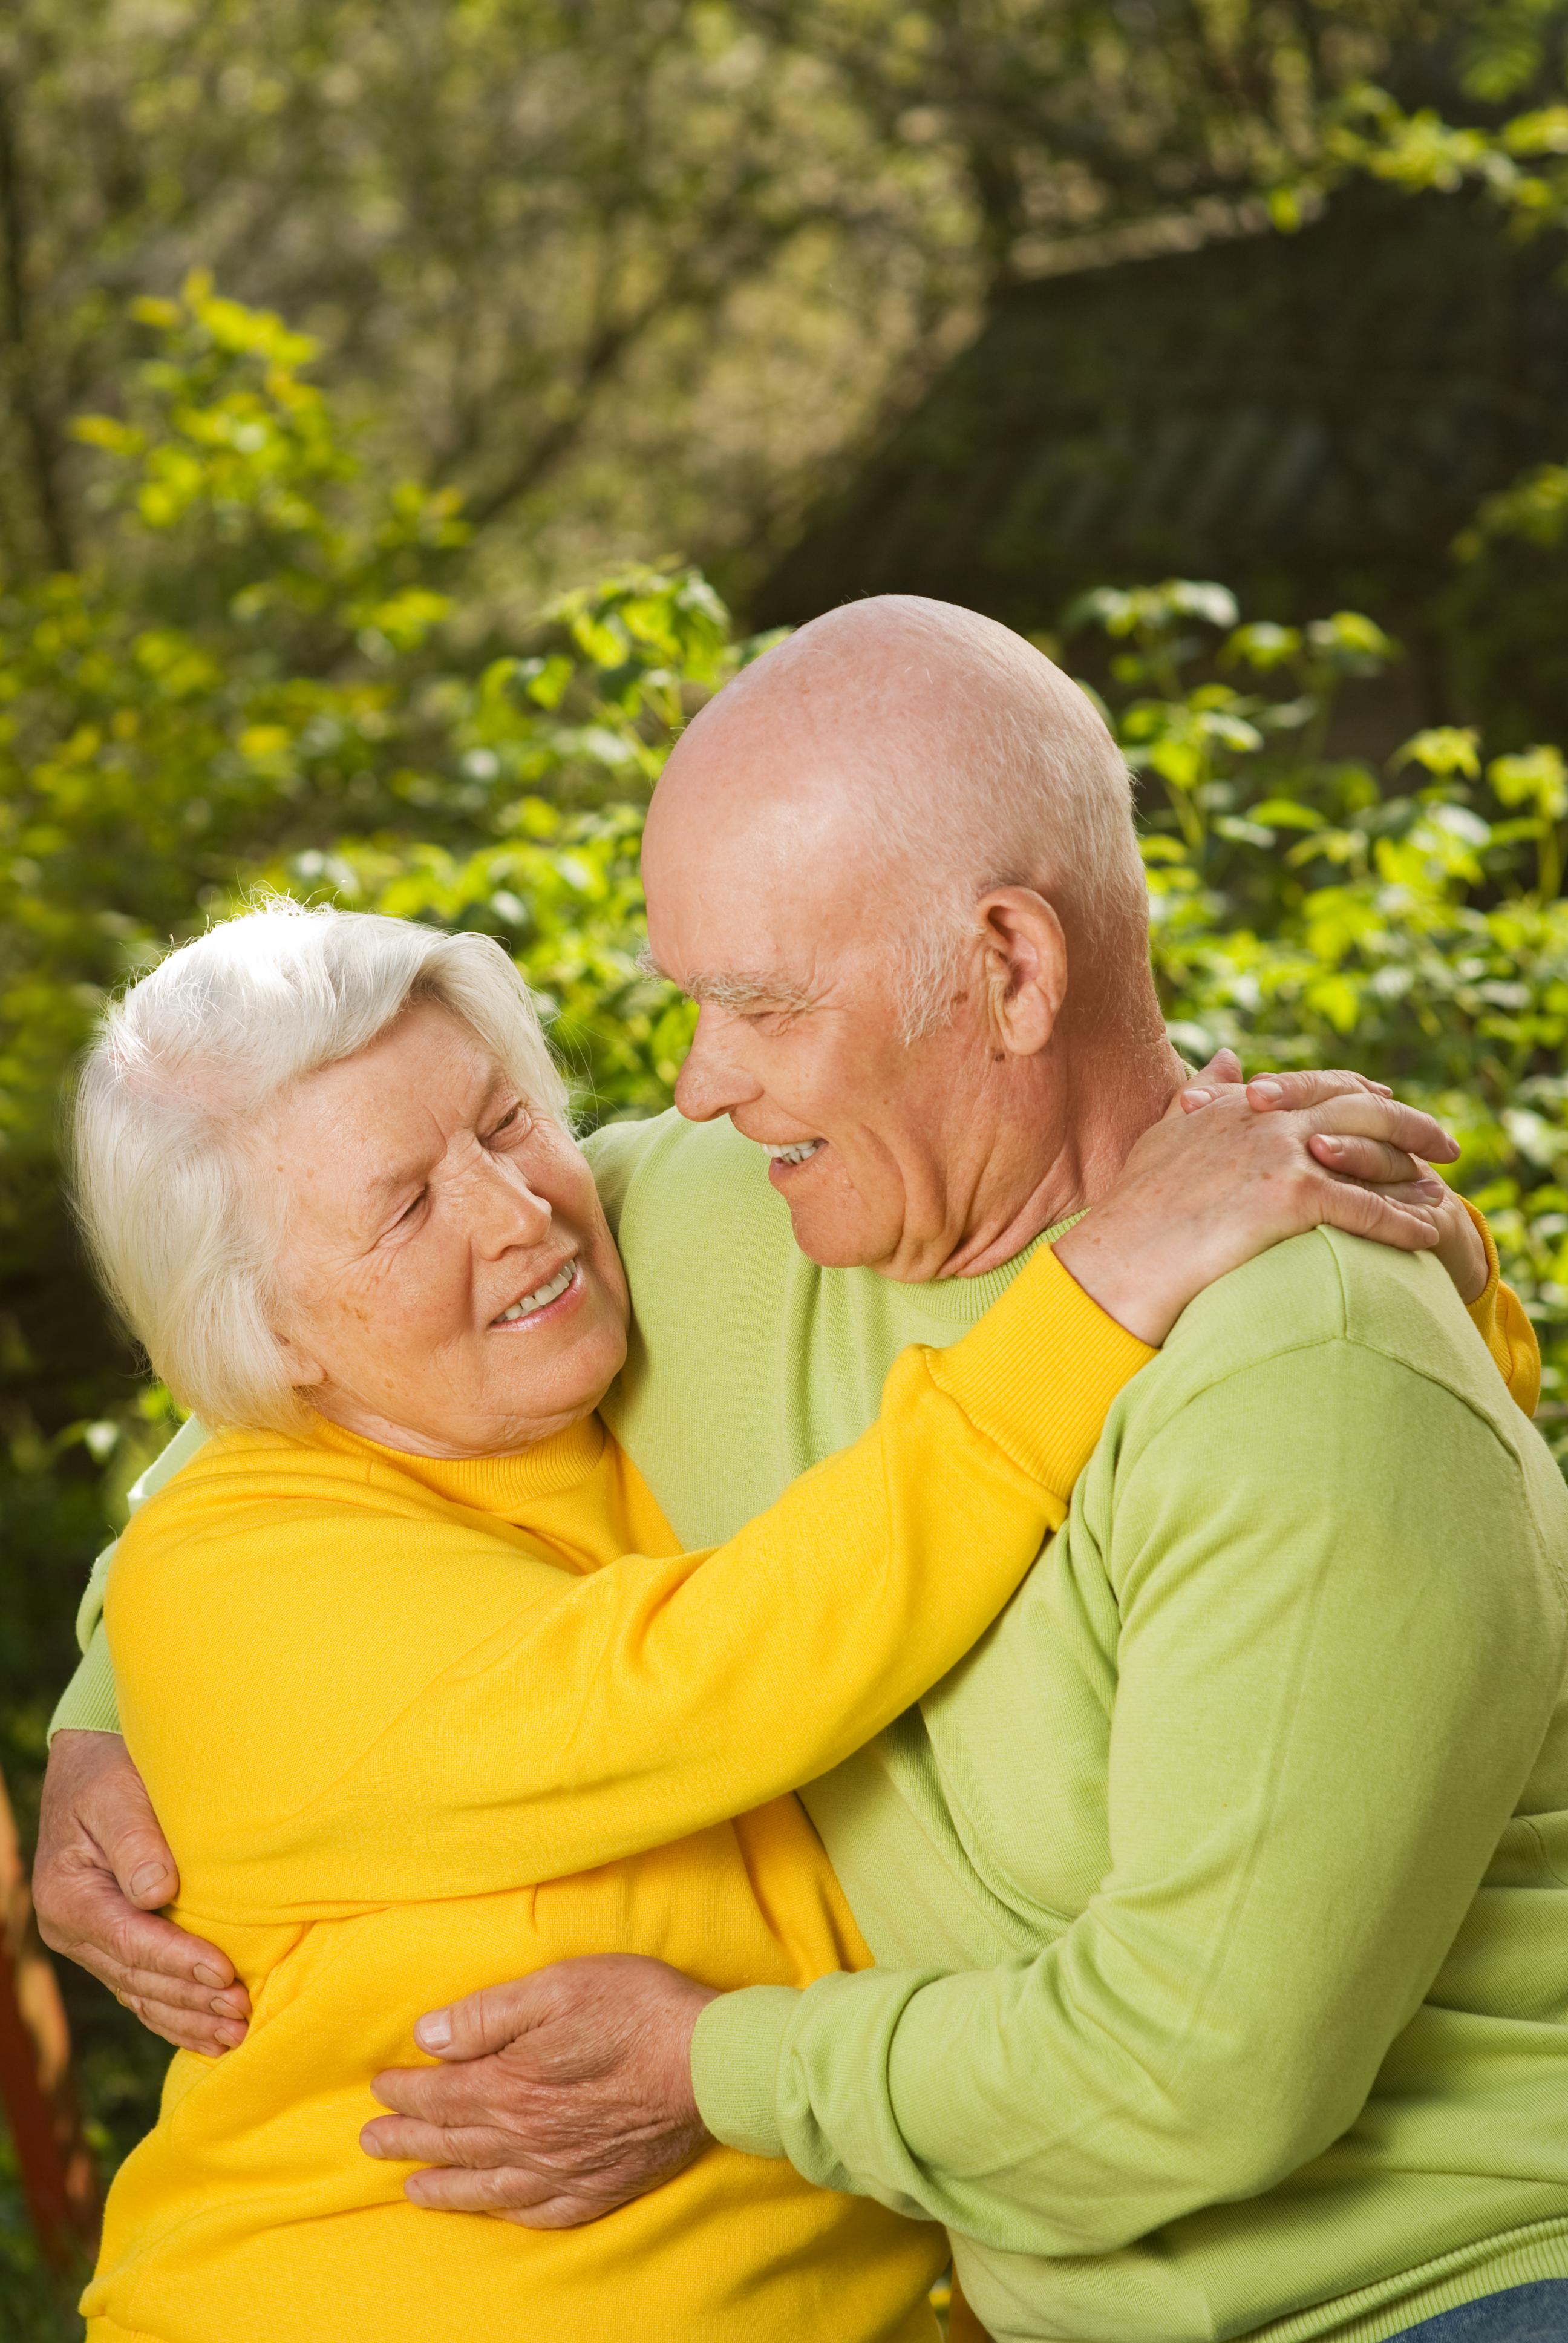 Senior Online Dating Sites No Register Needed